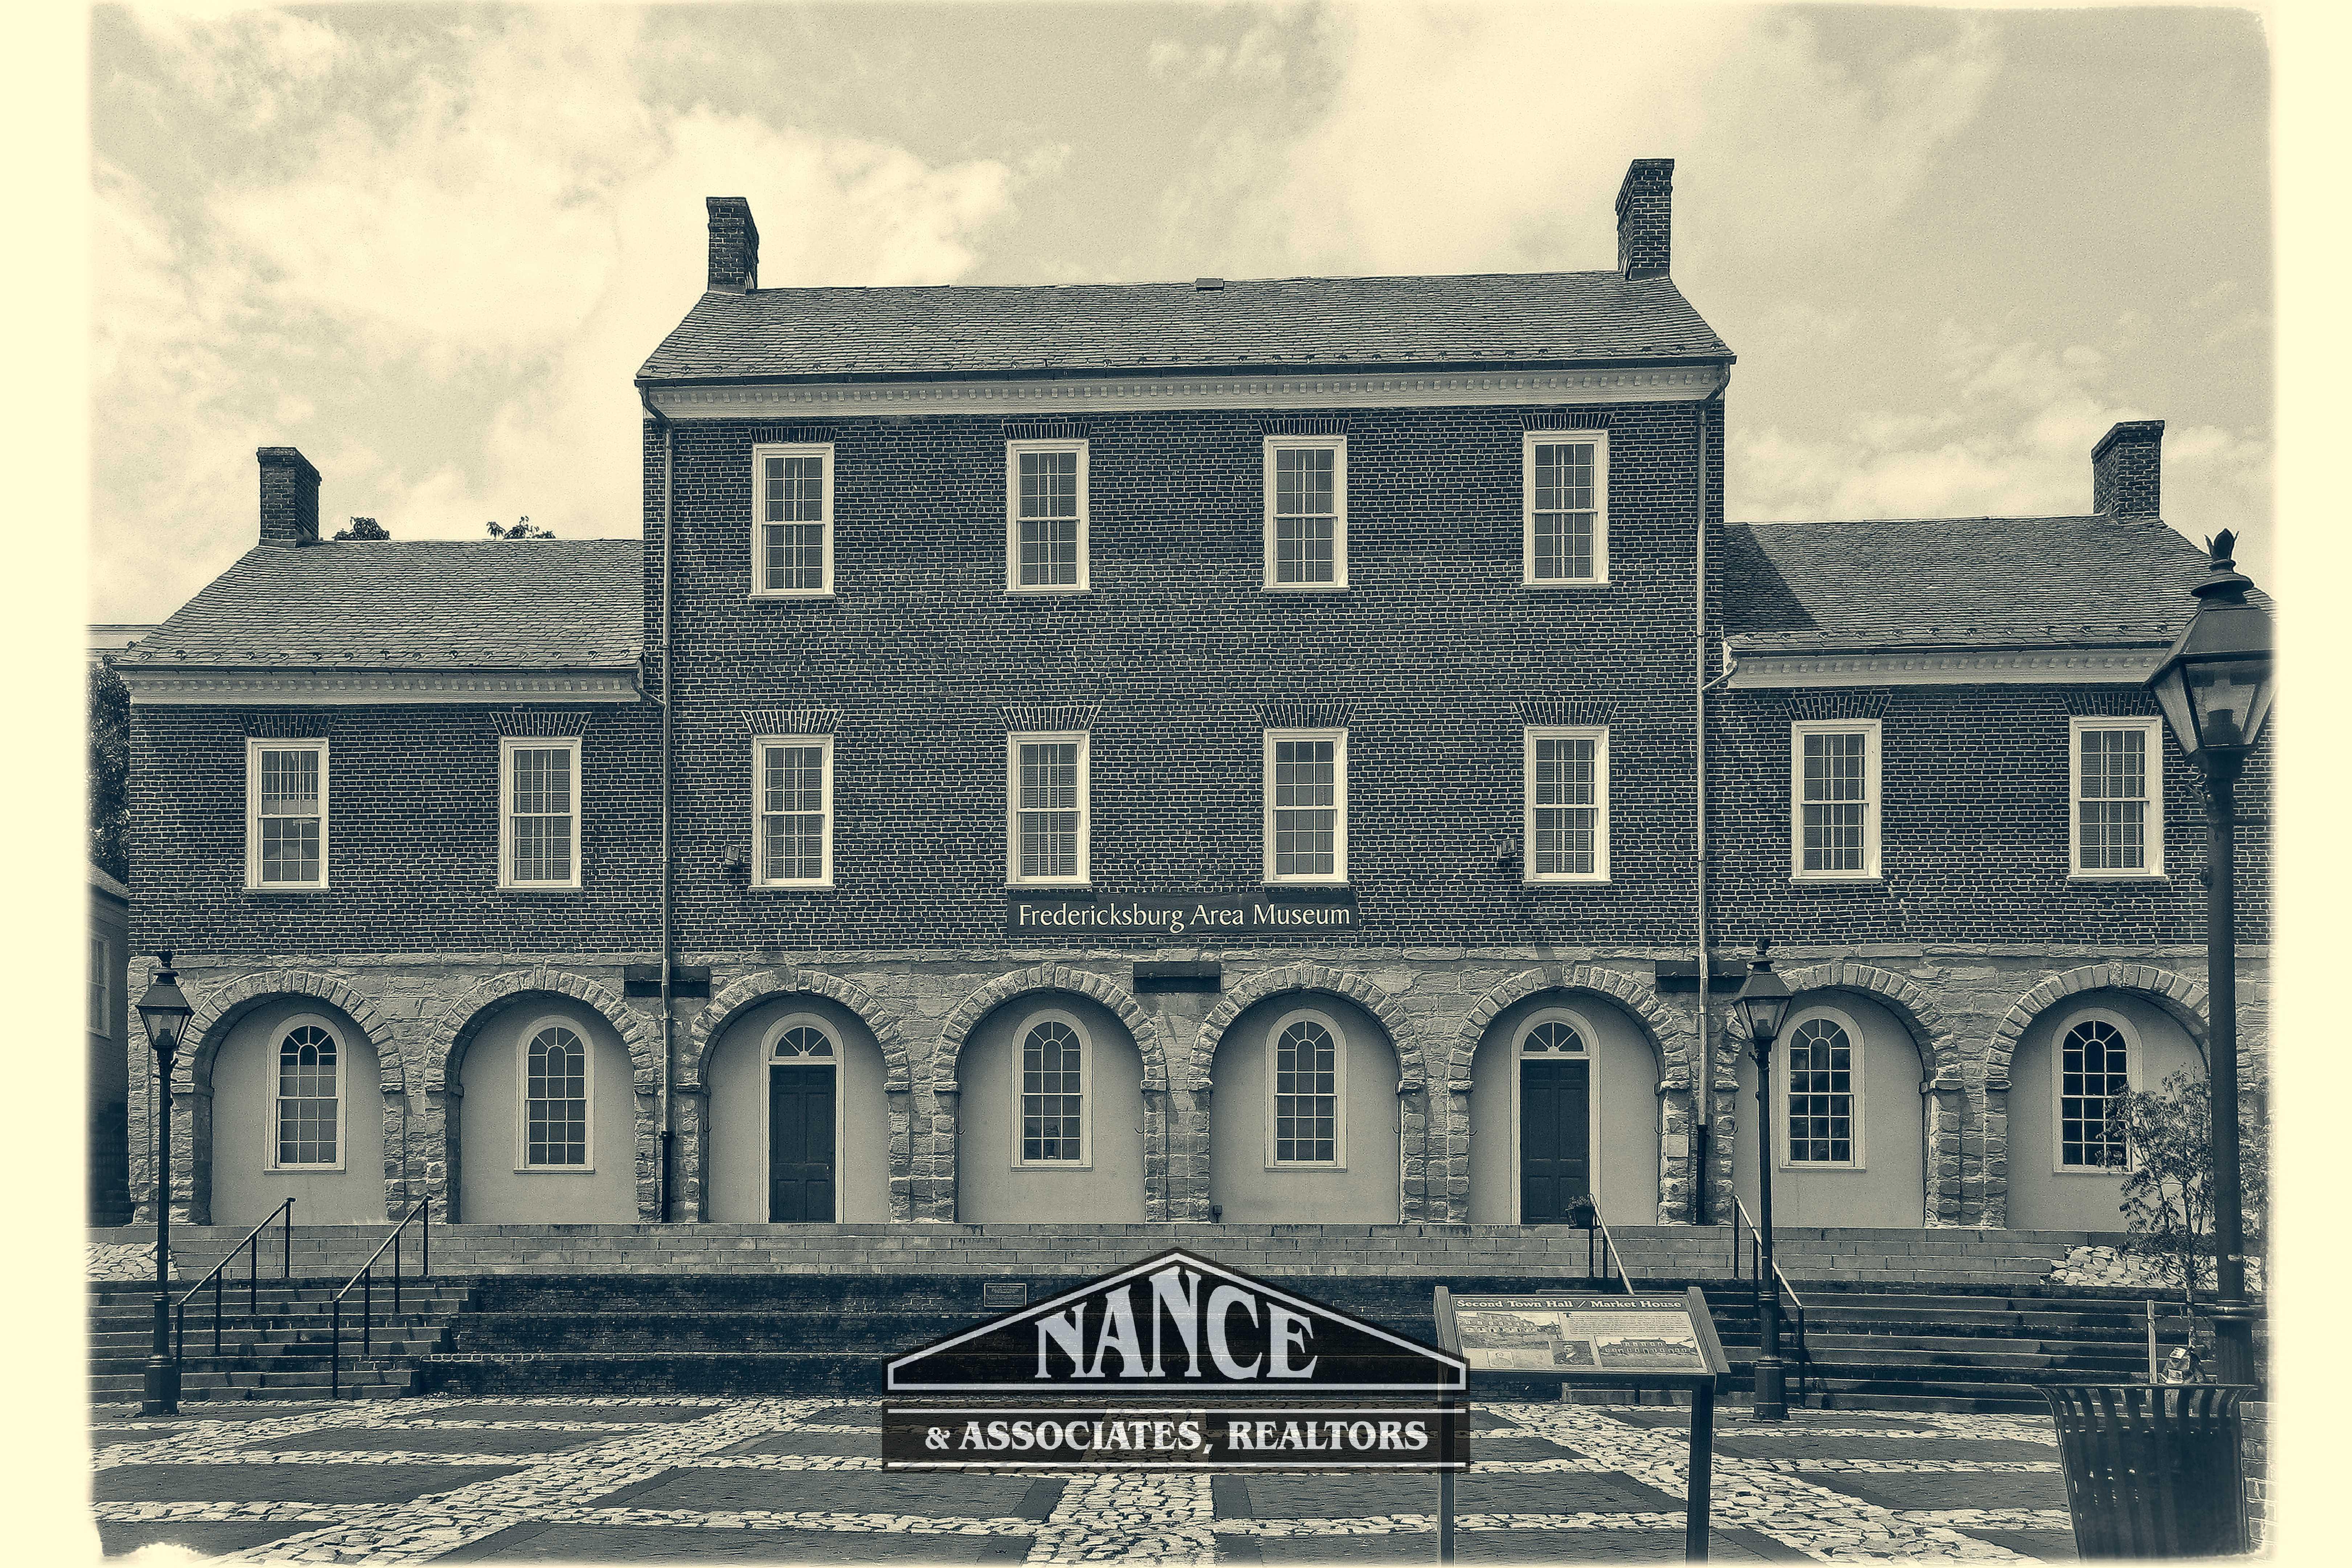 Fredericksburg Area Museum - Fredericksburg Virginia